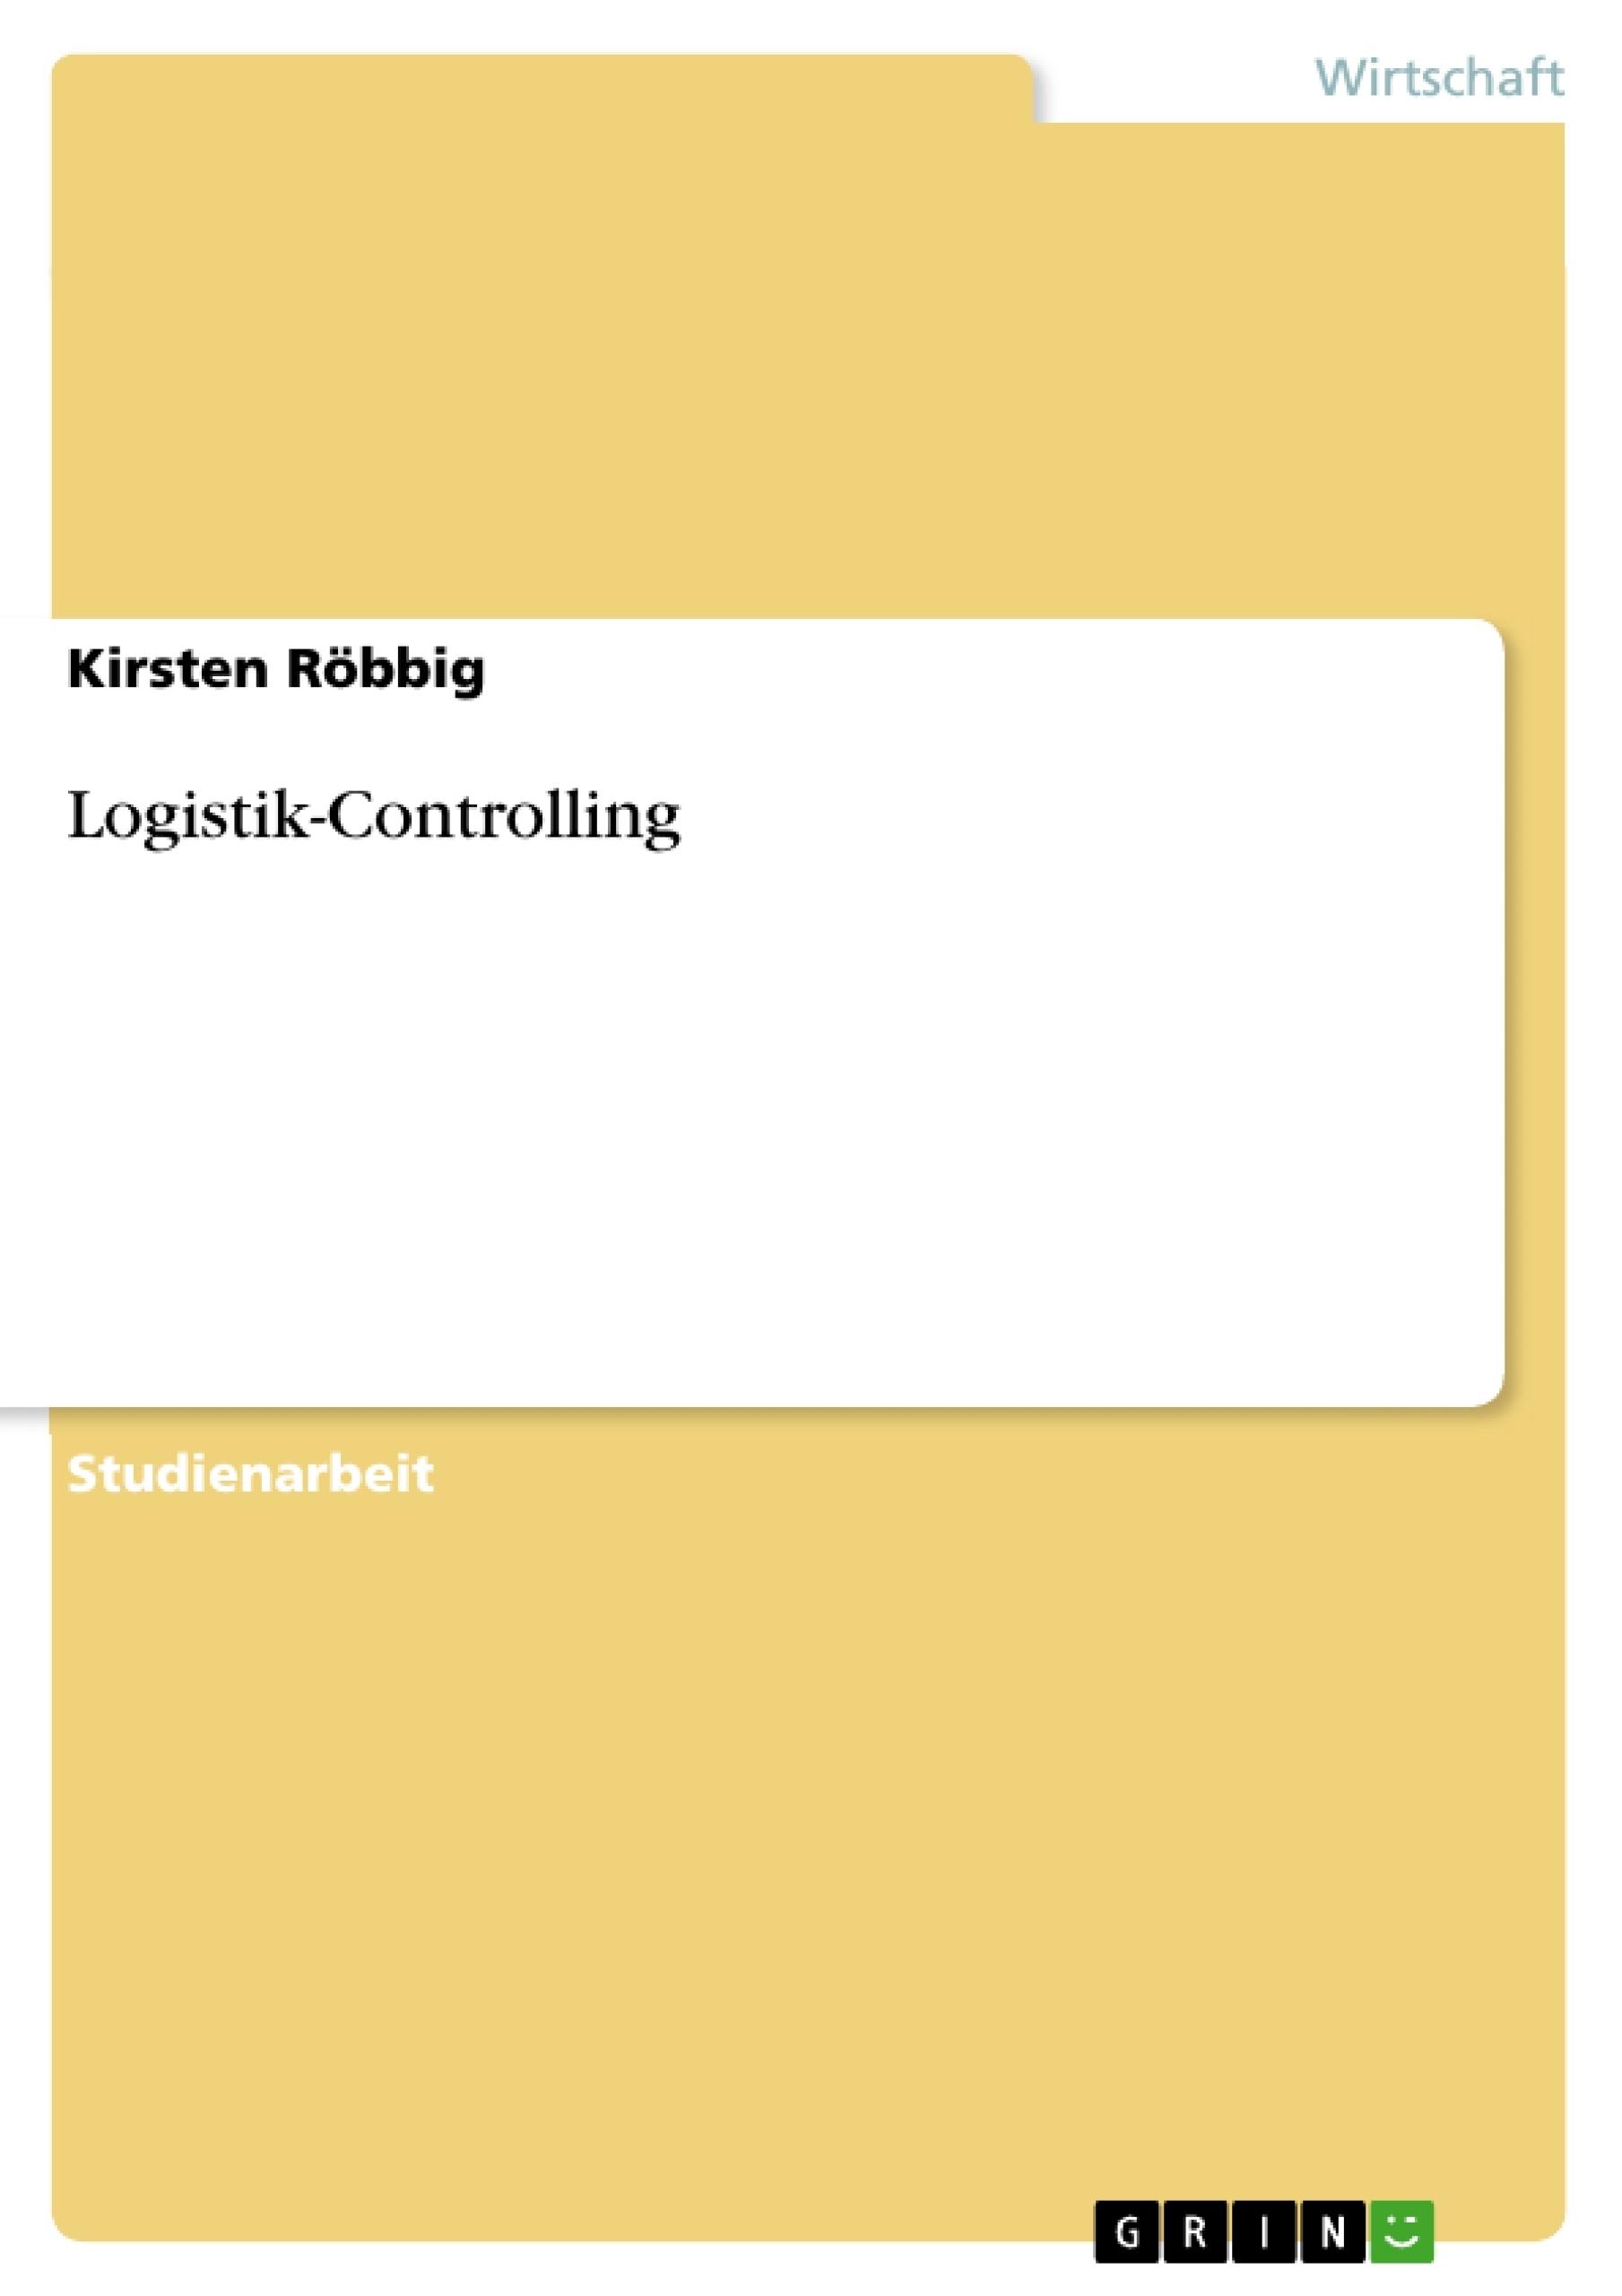 Titel: Logistik-Controlling